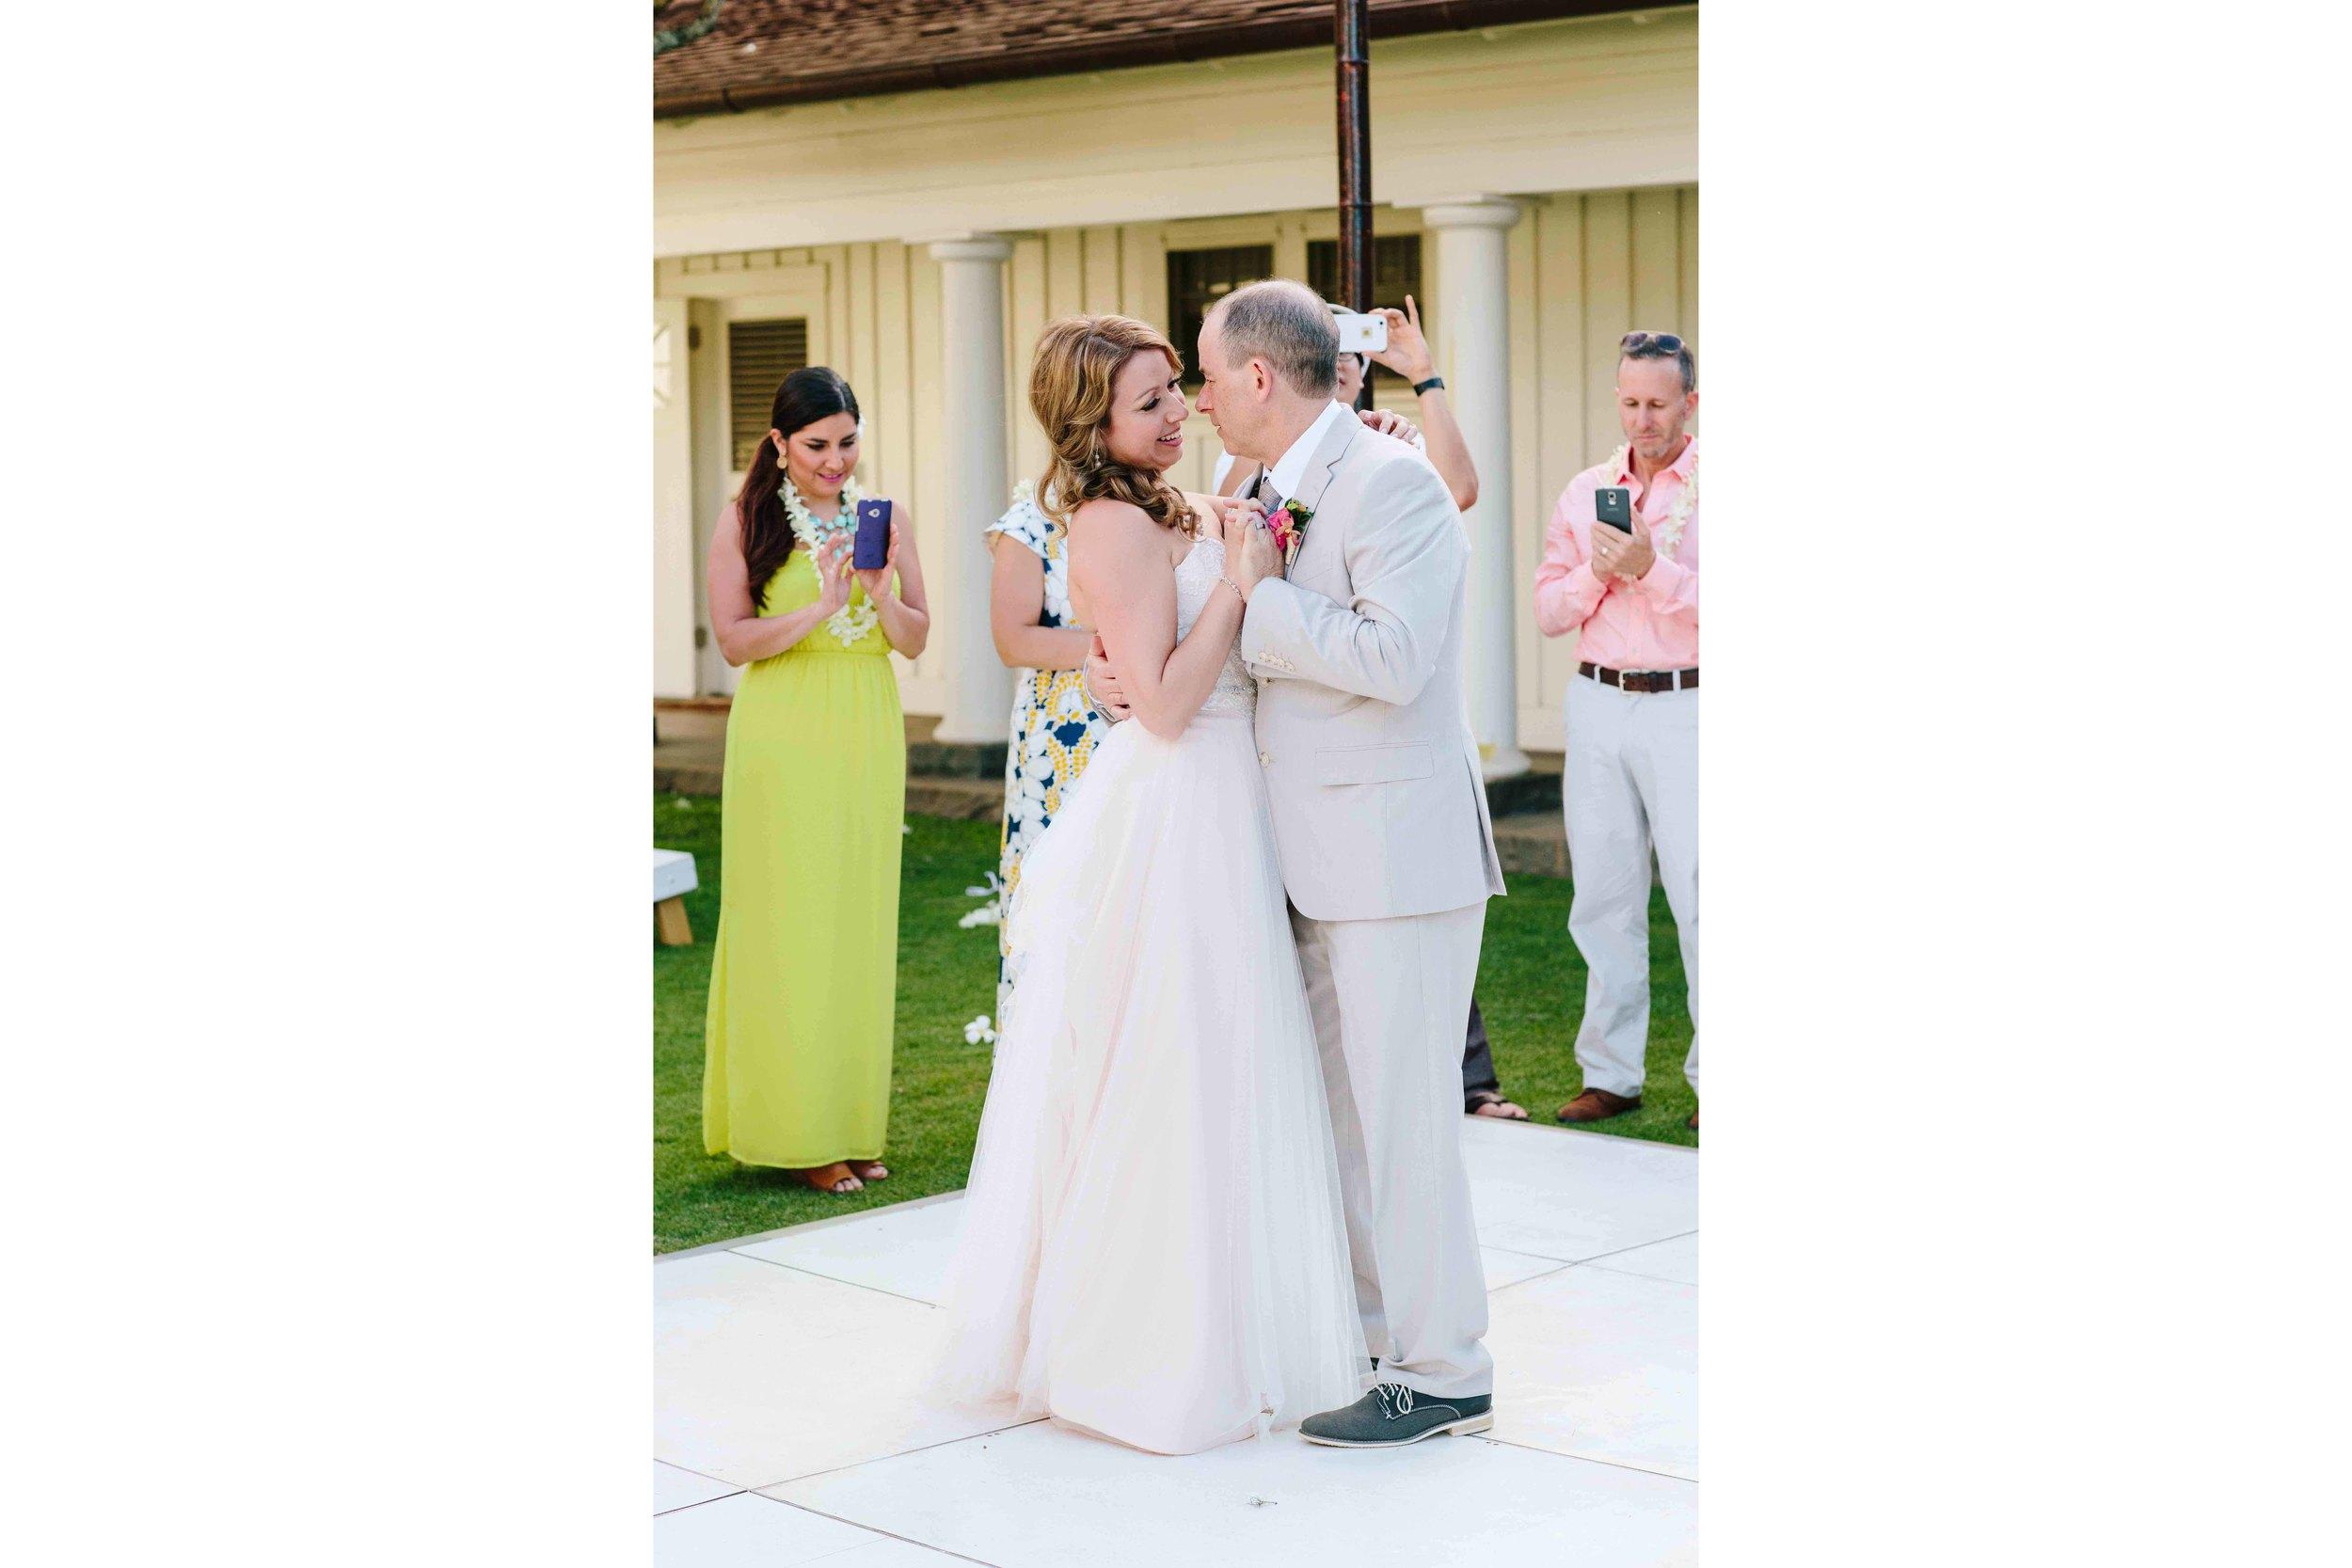 Hawaii Wedding Photography - First Dance